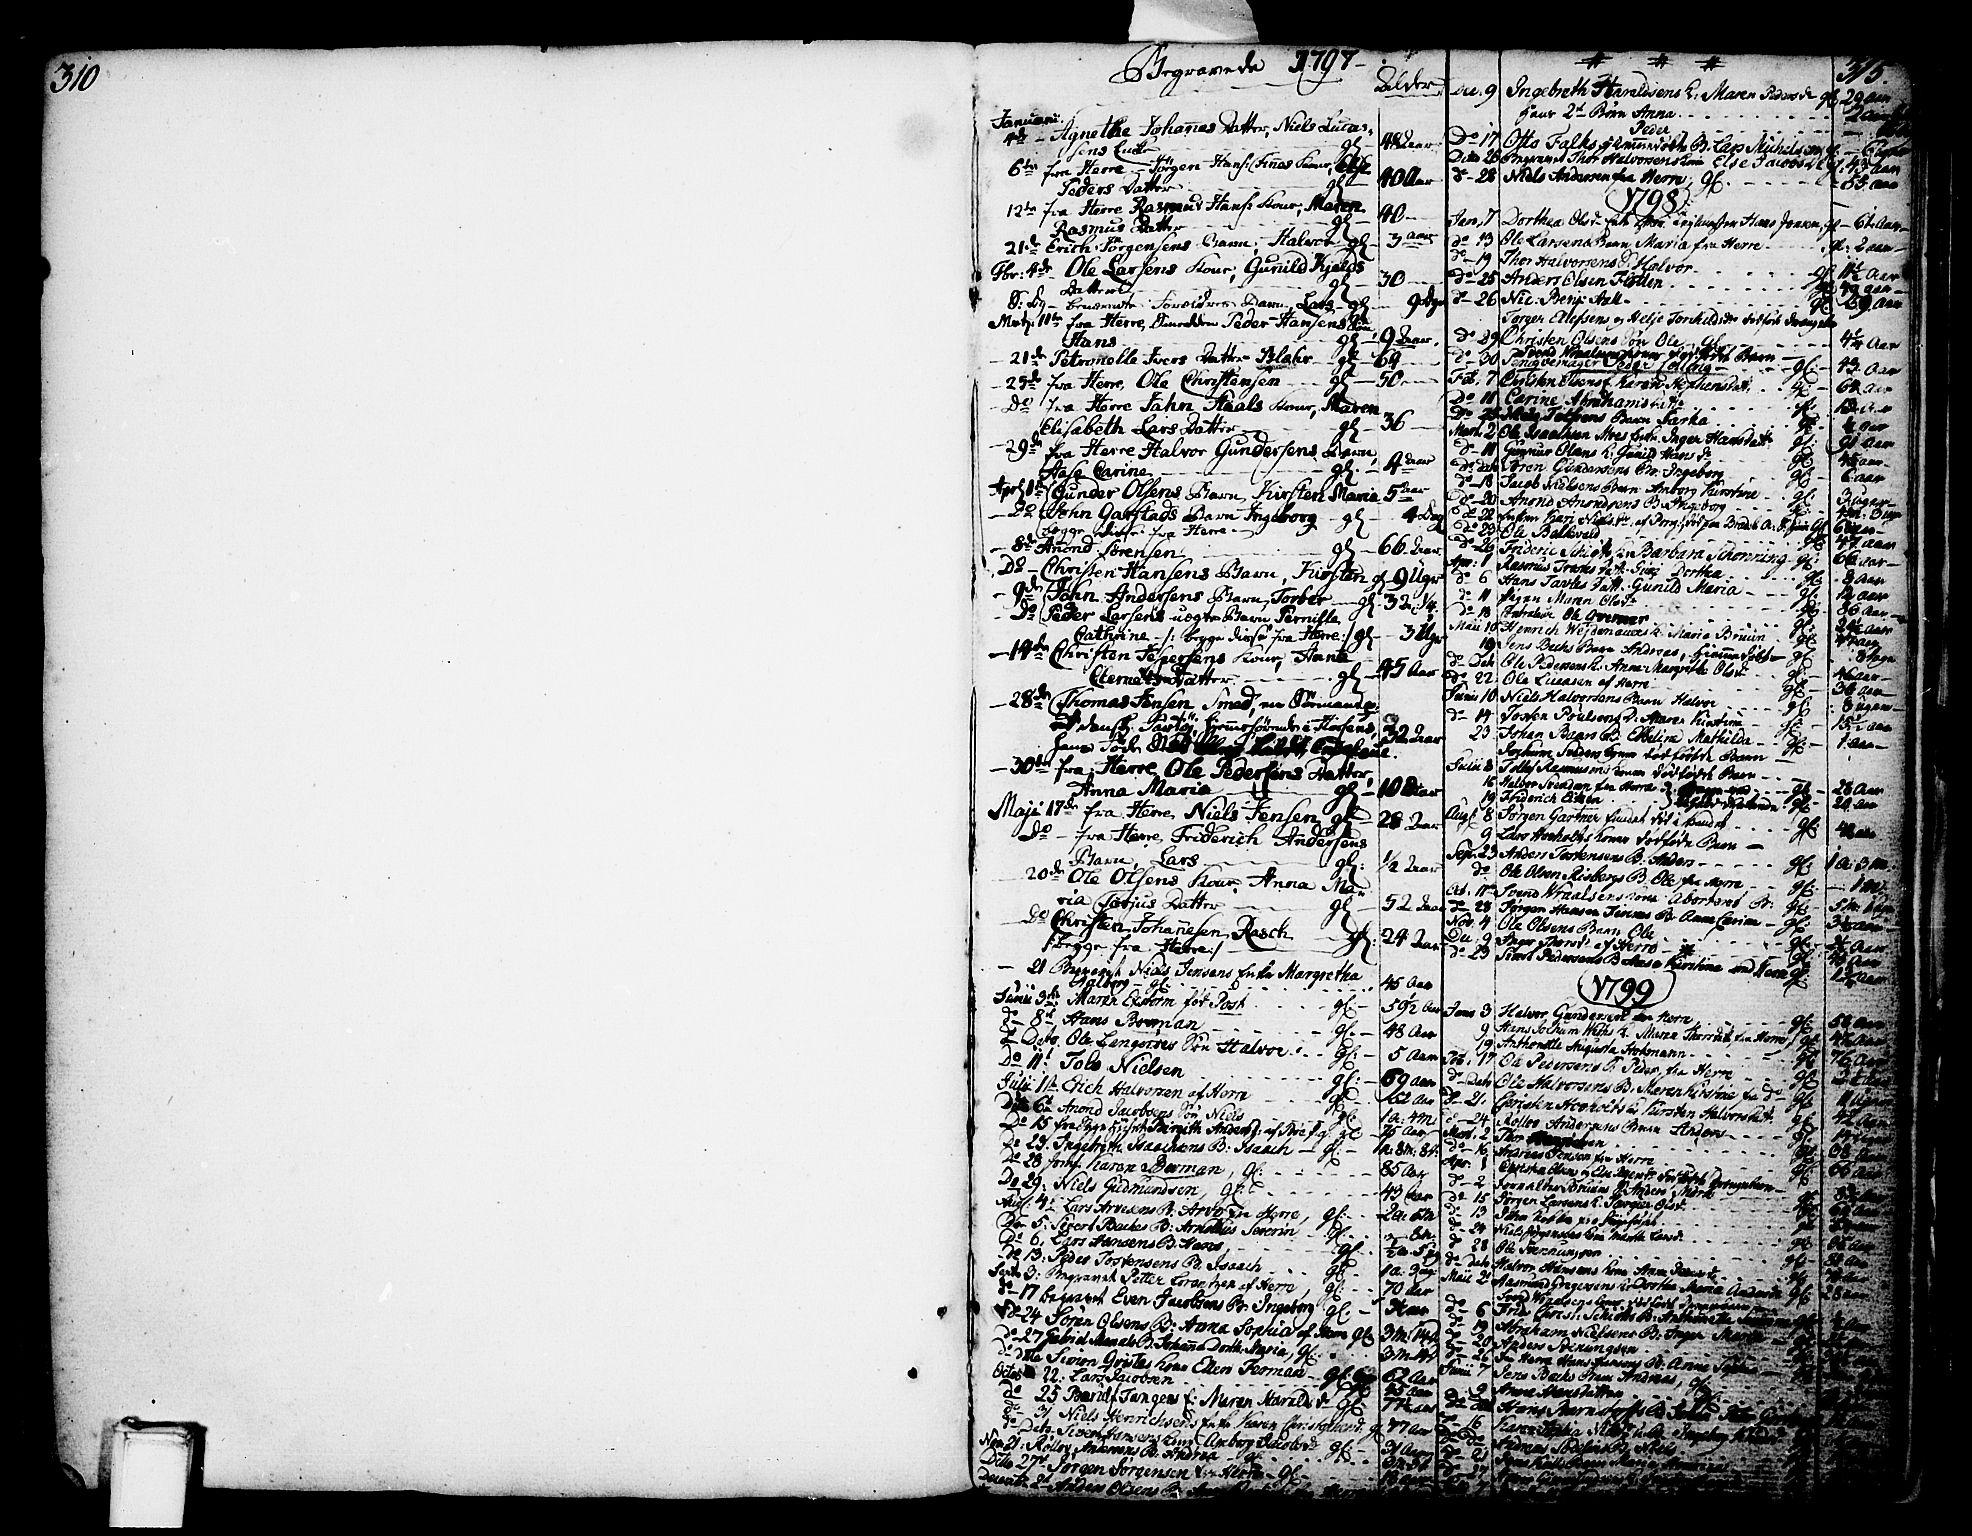 SAKO, Porsgrunn kirkebøker , F/Fa/L0002: Parish register (official) no. 2, 1764-1814, p. 314-315